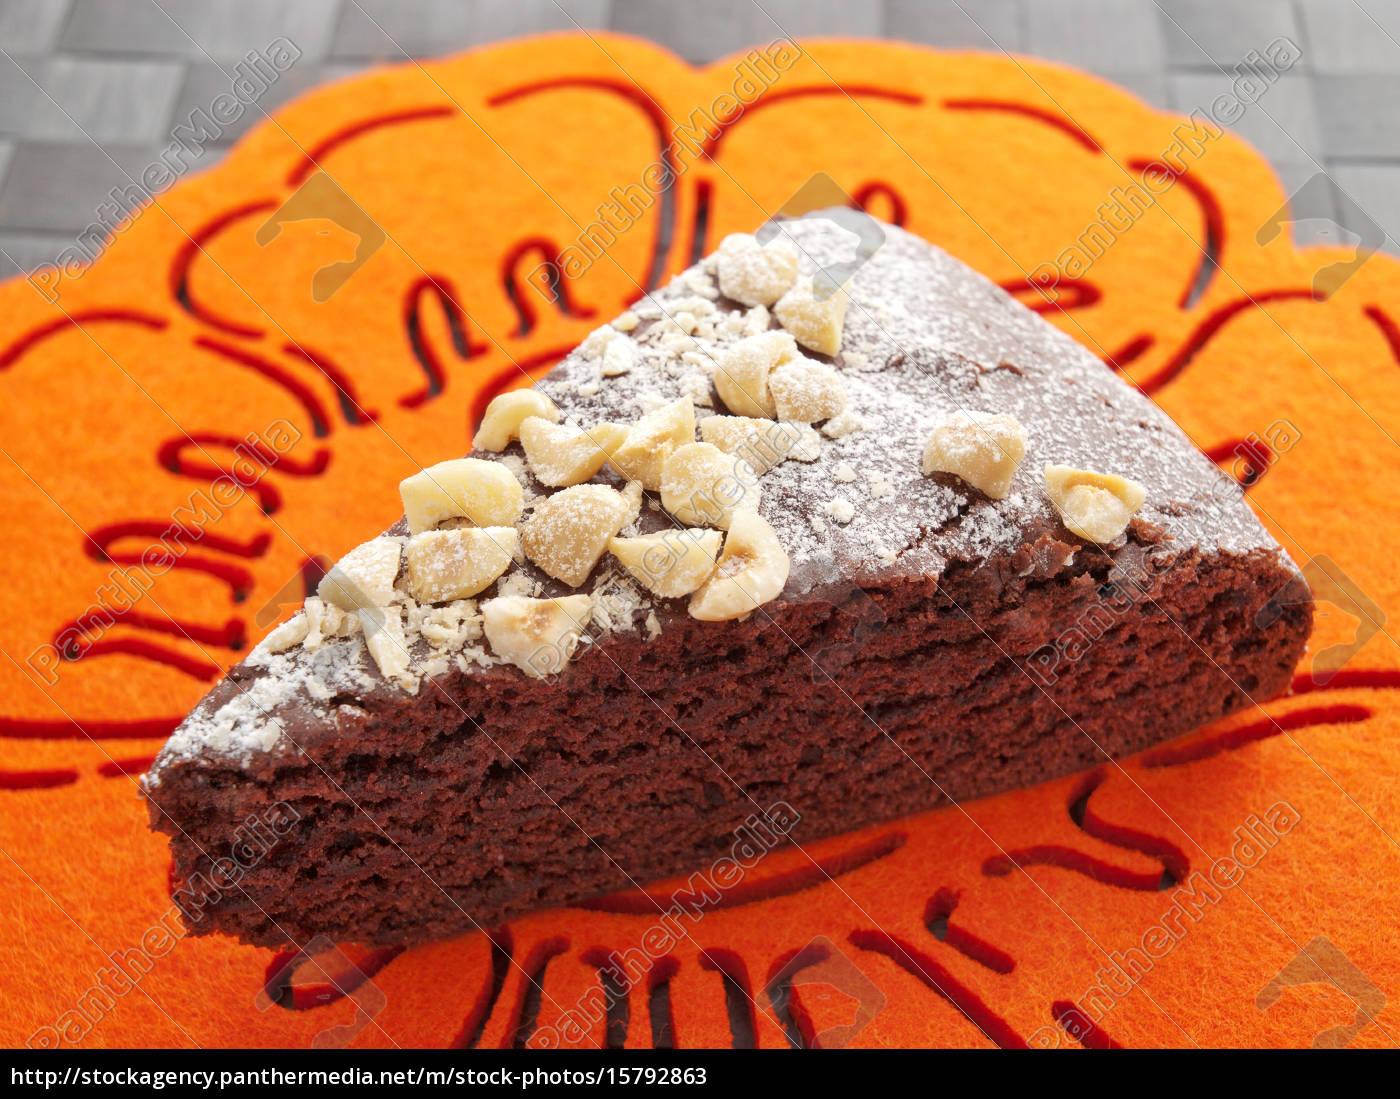 homemade, chocolate, cake, homemade, chocolate, cake, homemade, chocolate - 15792863